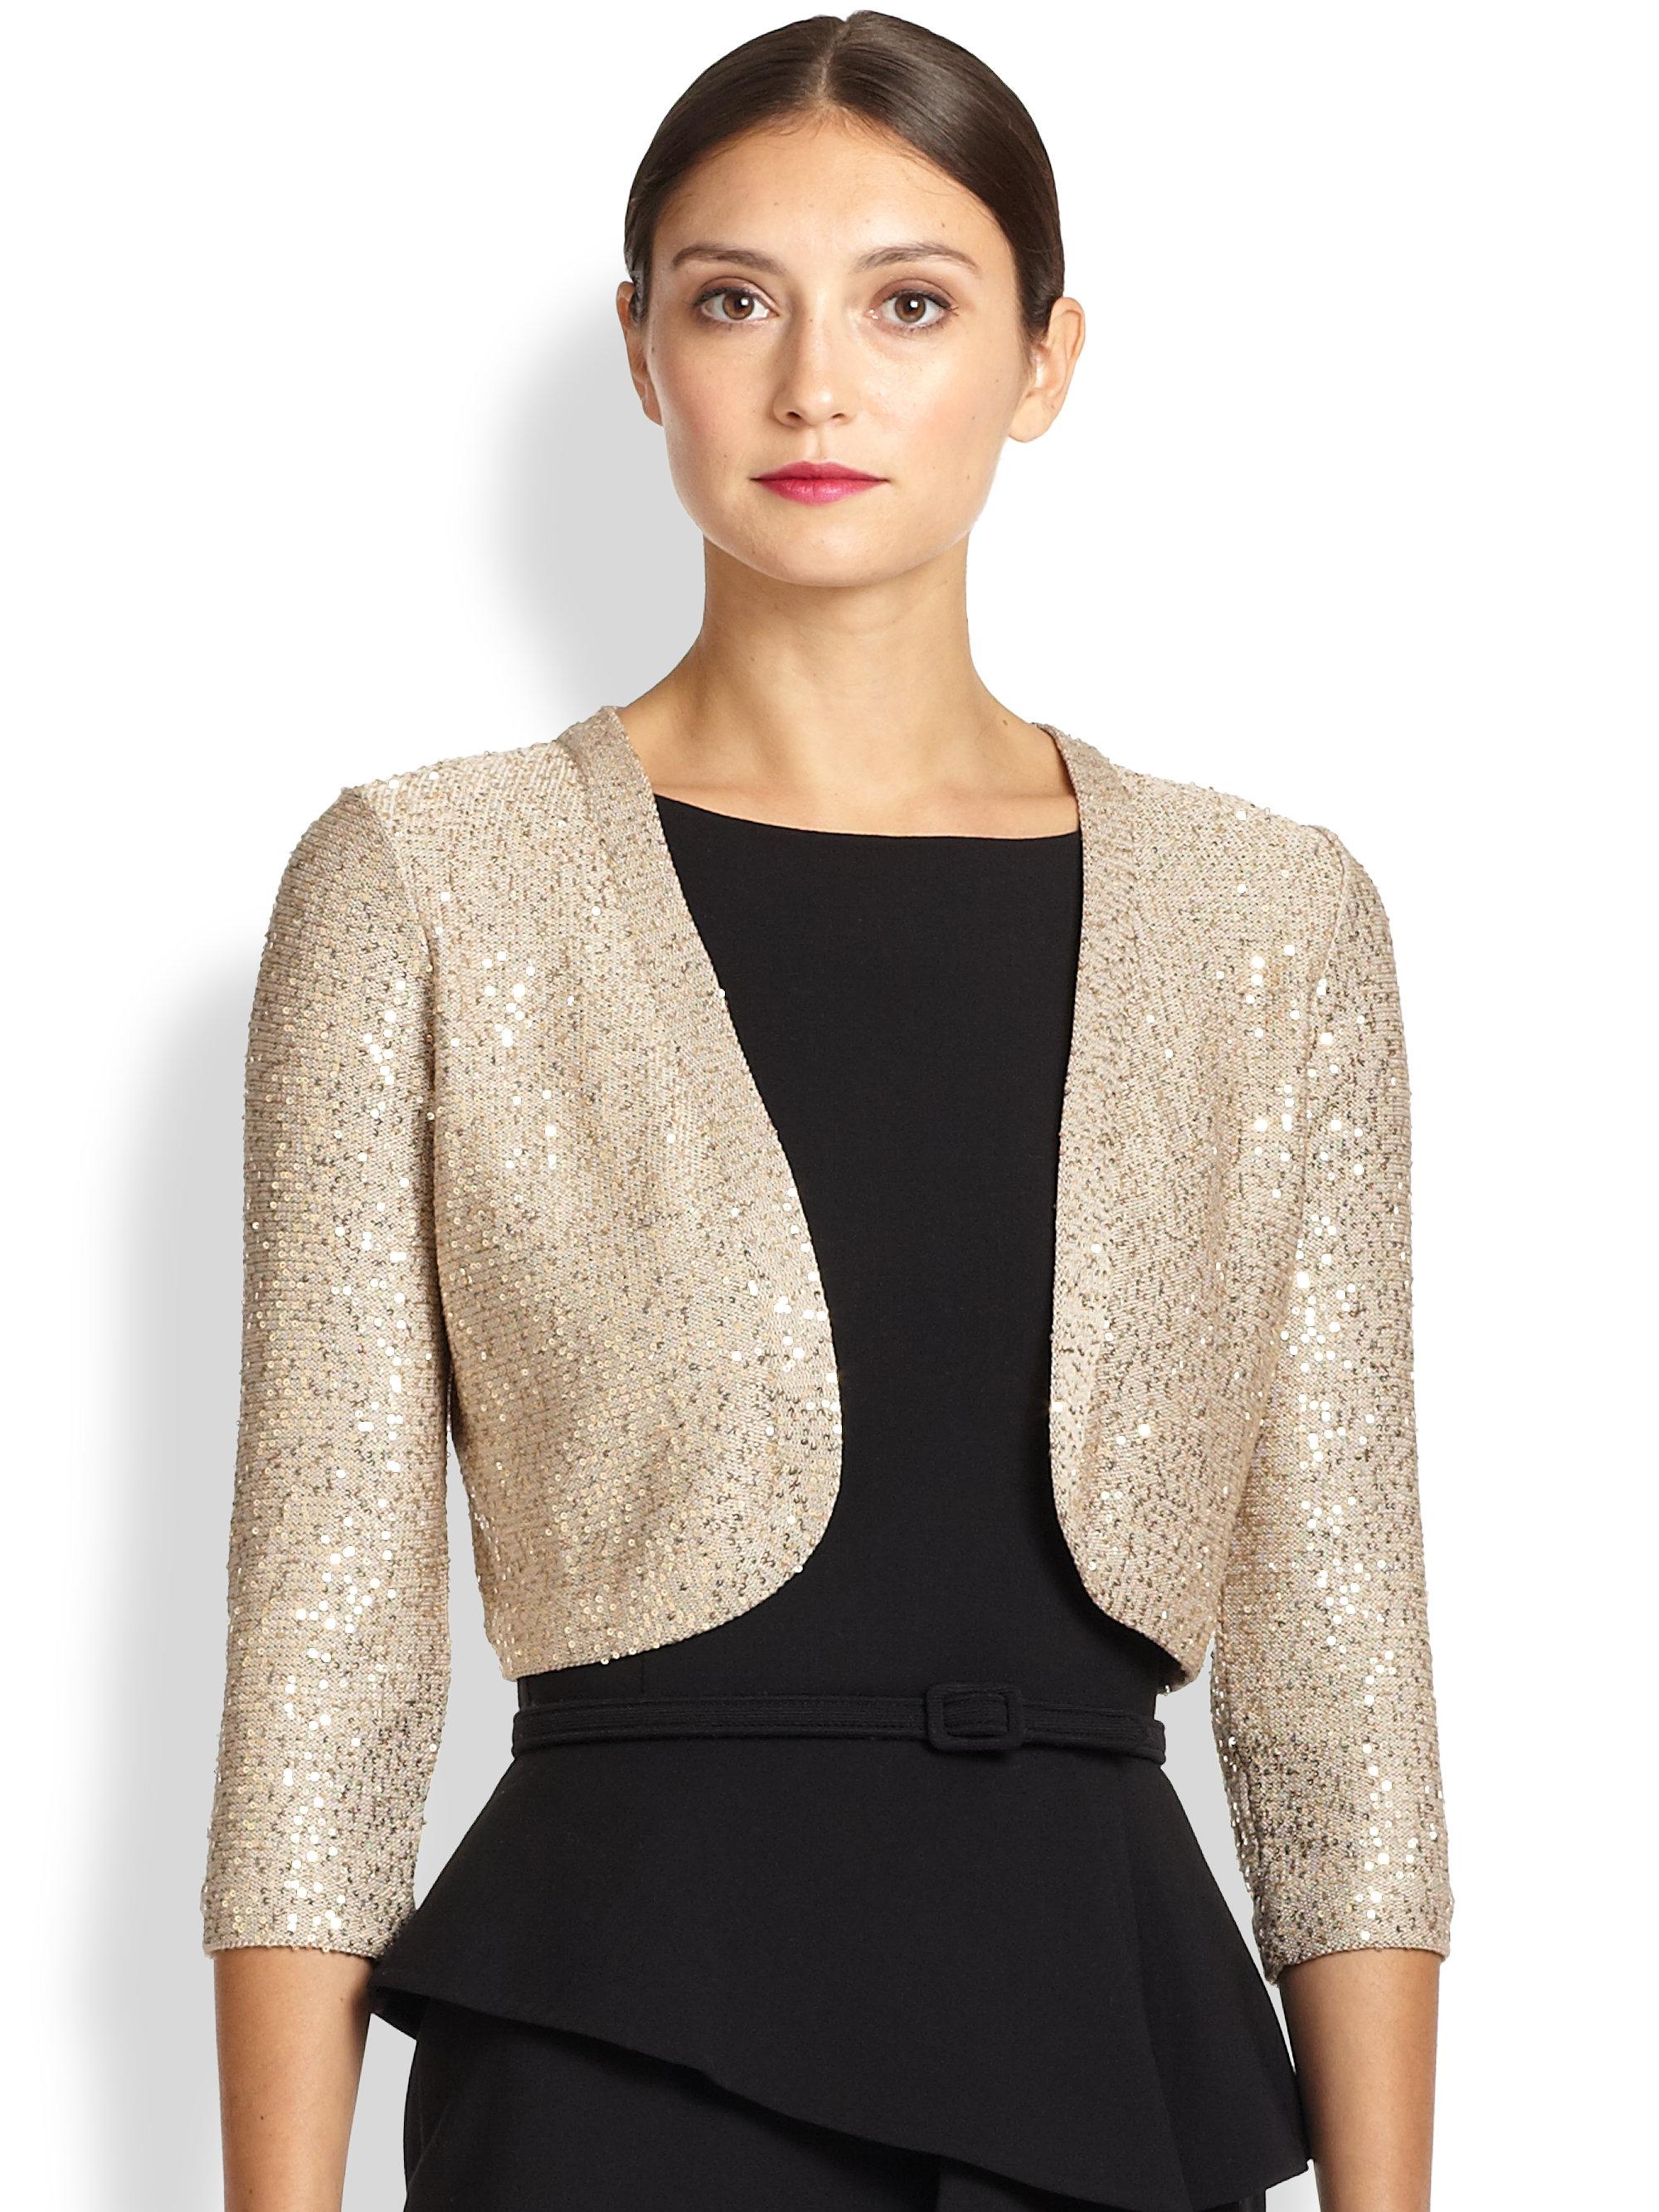 oscar de la renta sequined bolero jacket in gold lyst. Black Bedroom Furniture Sets. Home Design Ideas